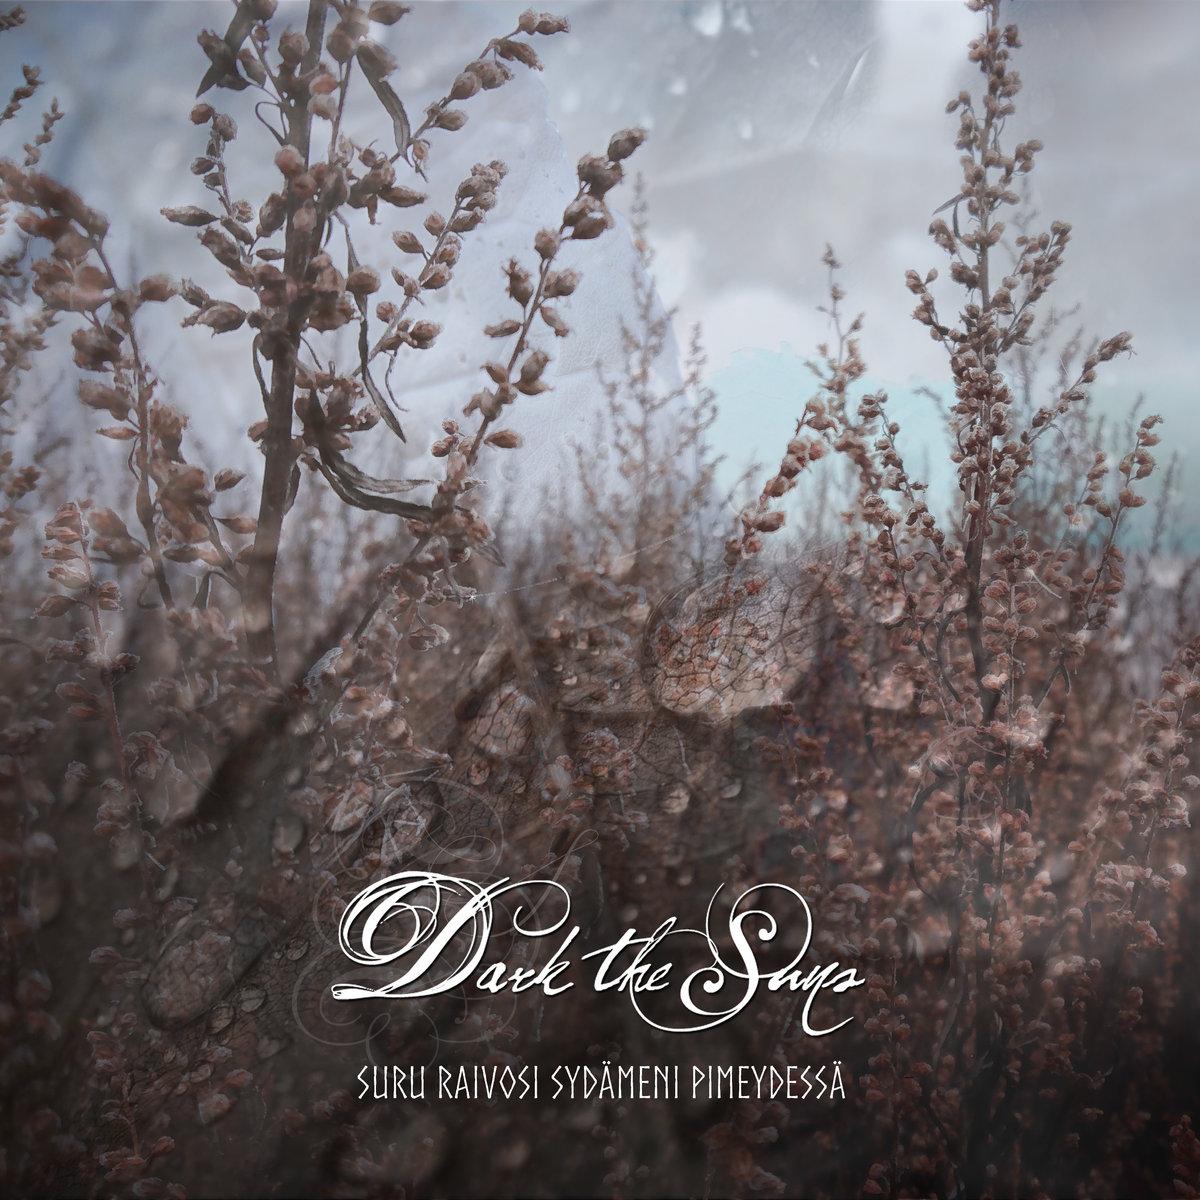 Dark The Sun Suru Raivosi Sydämeni Pimeydessä Album Cover Artwork